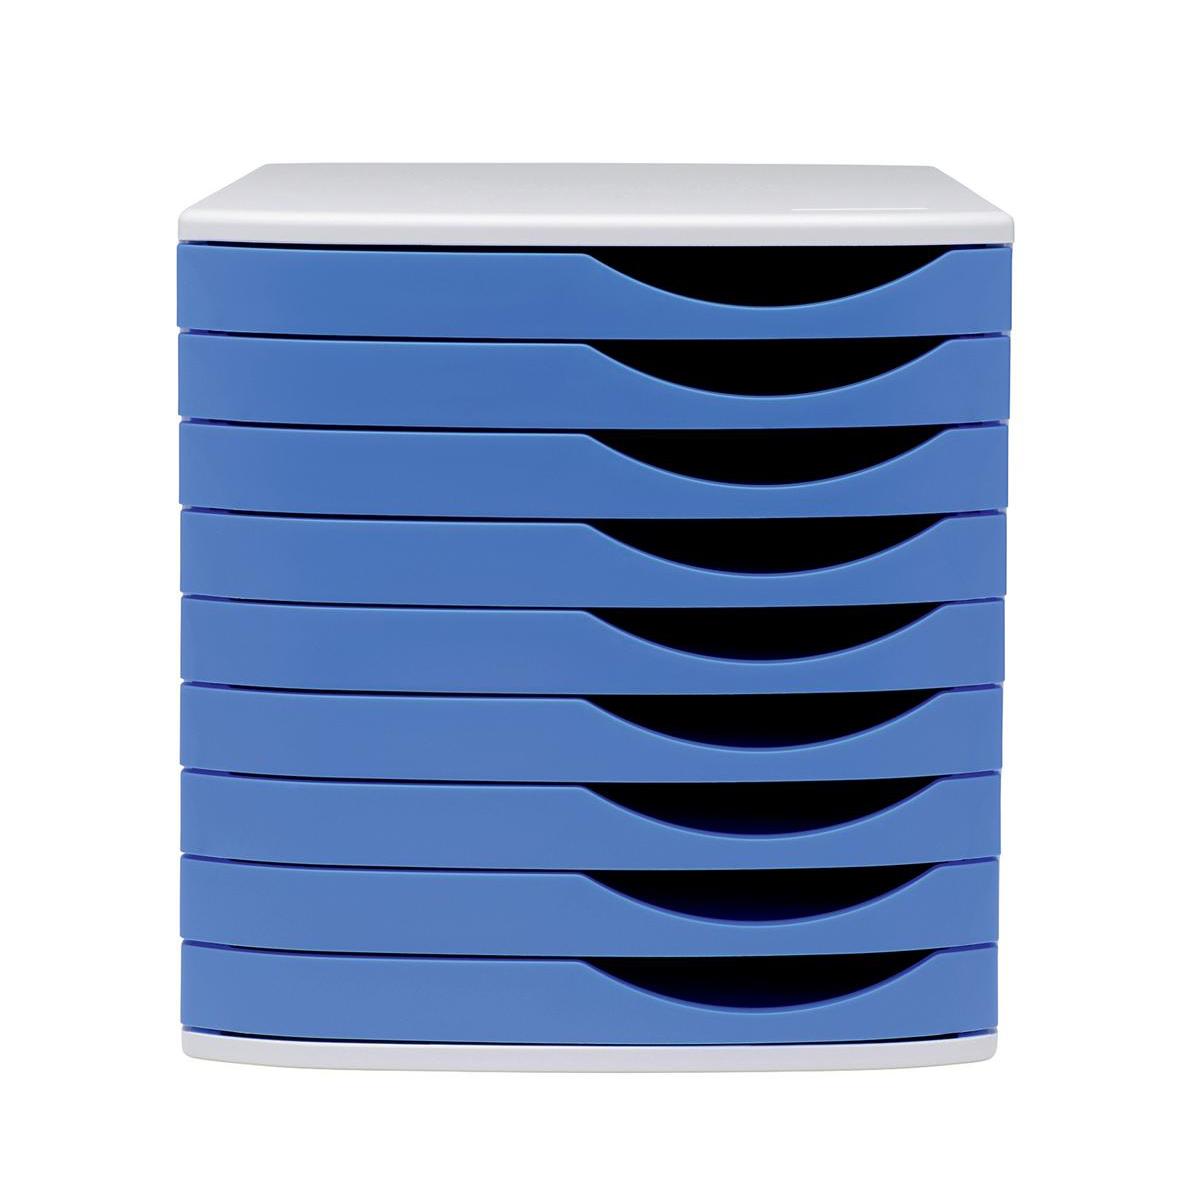 5 Star Elite Desktop Drawer Set 9 Drawers A4 & Documents up to 260x350mm Grey/Blue